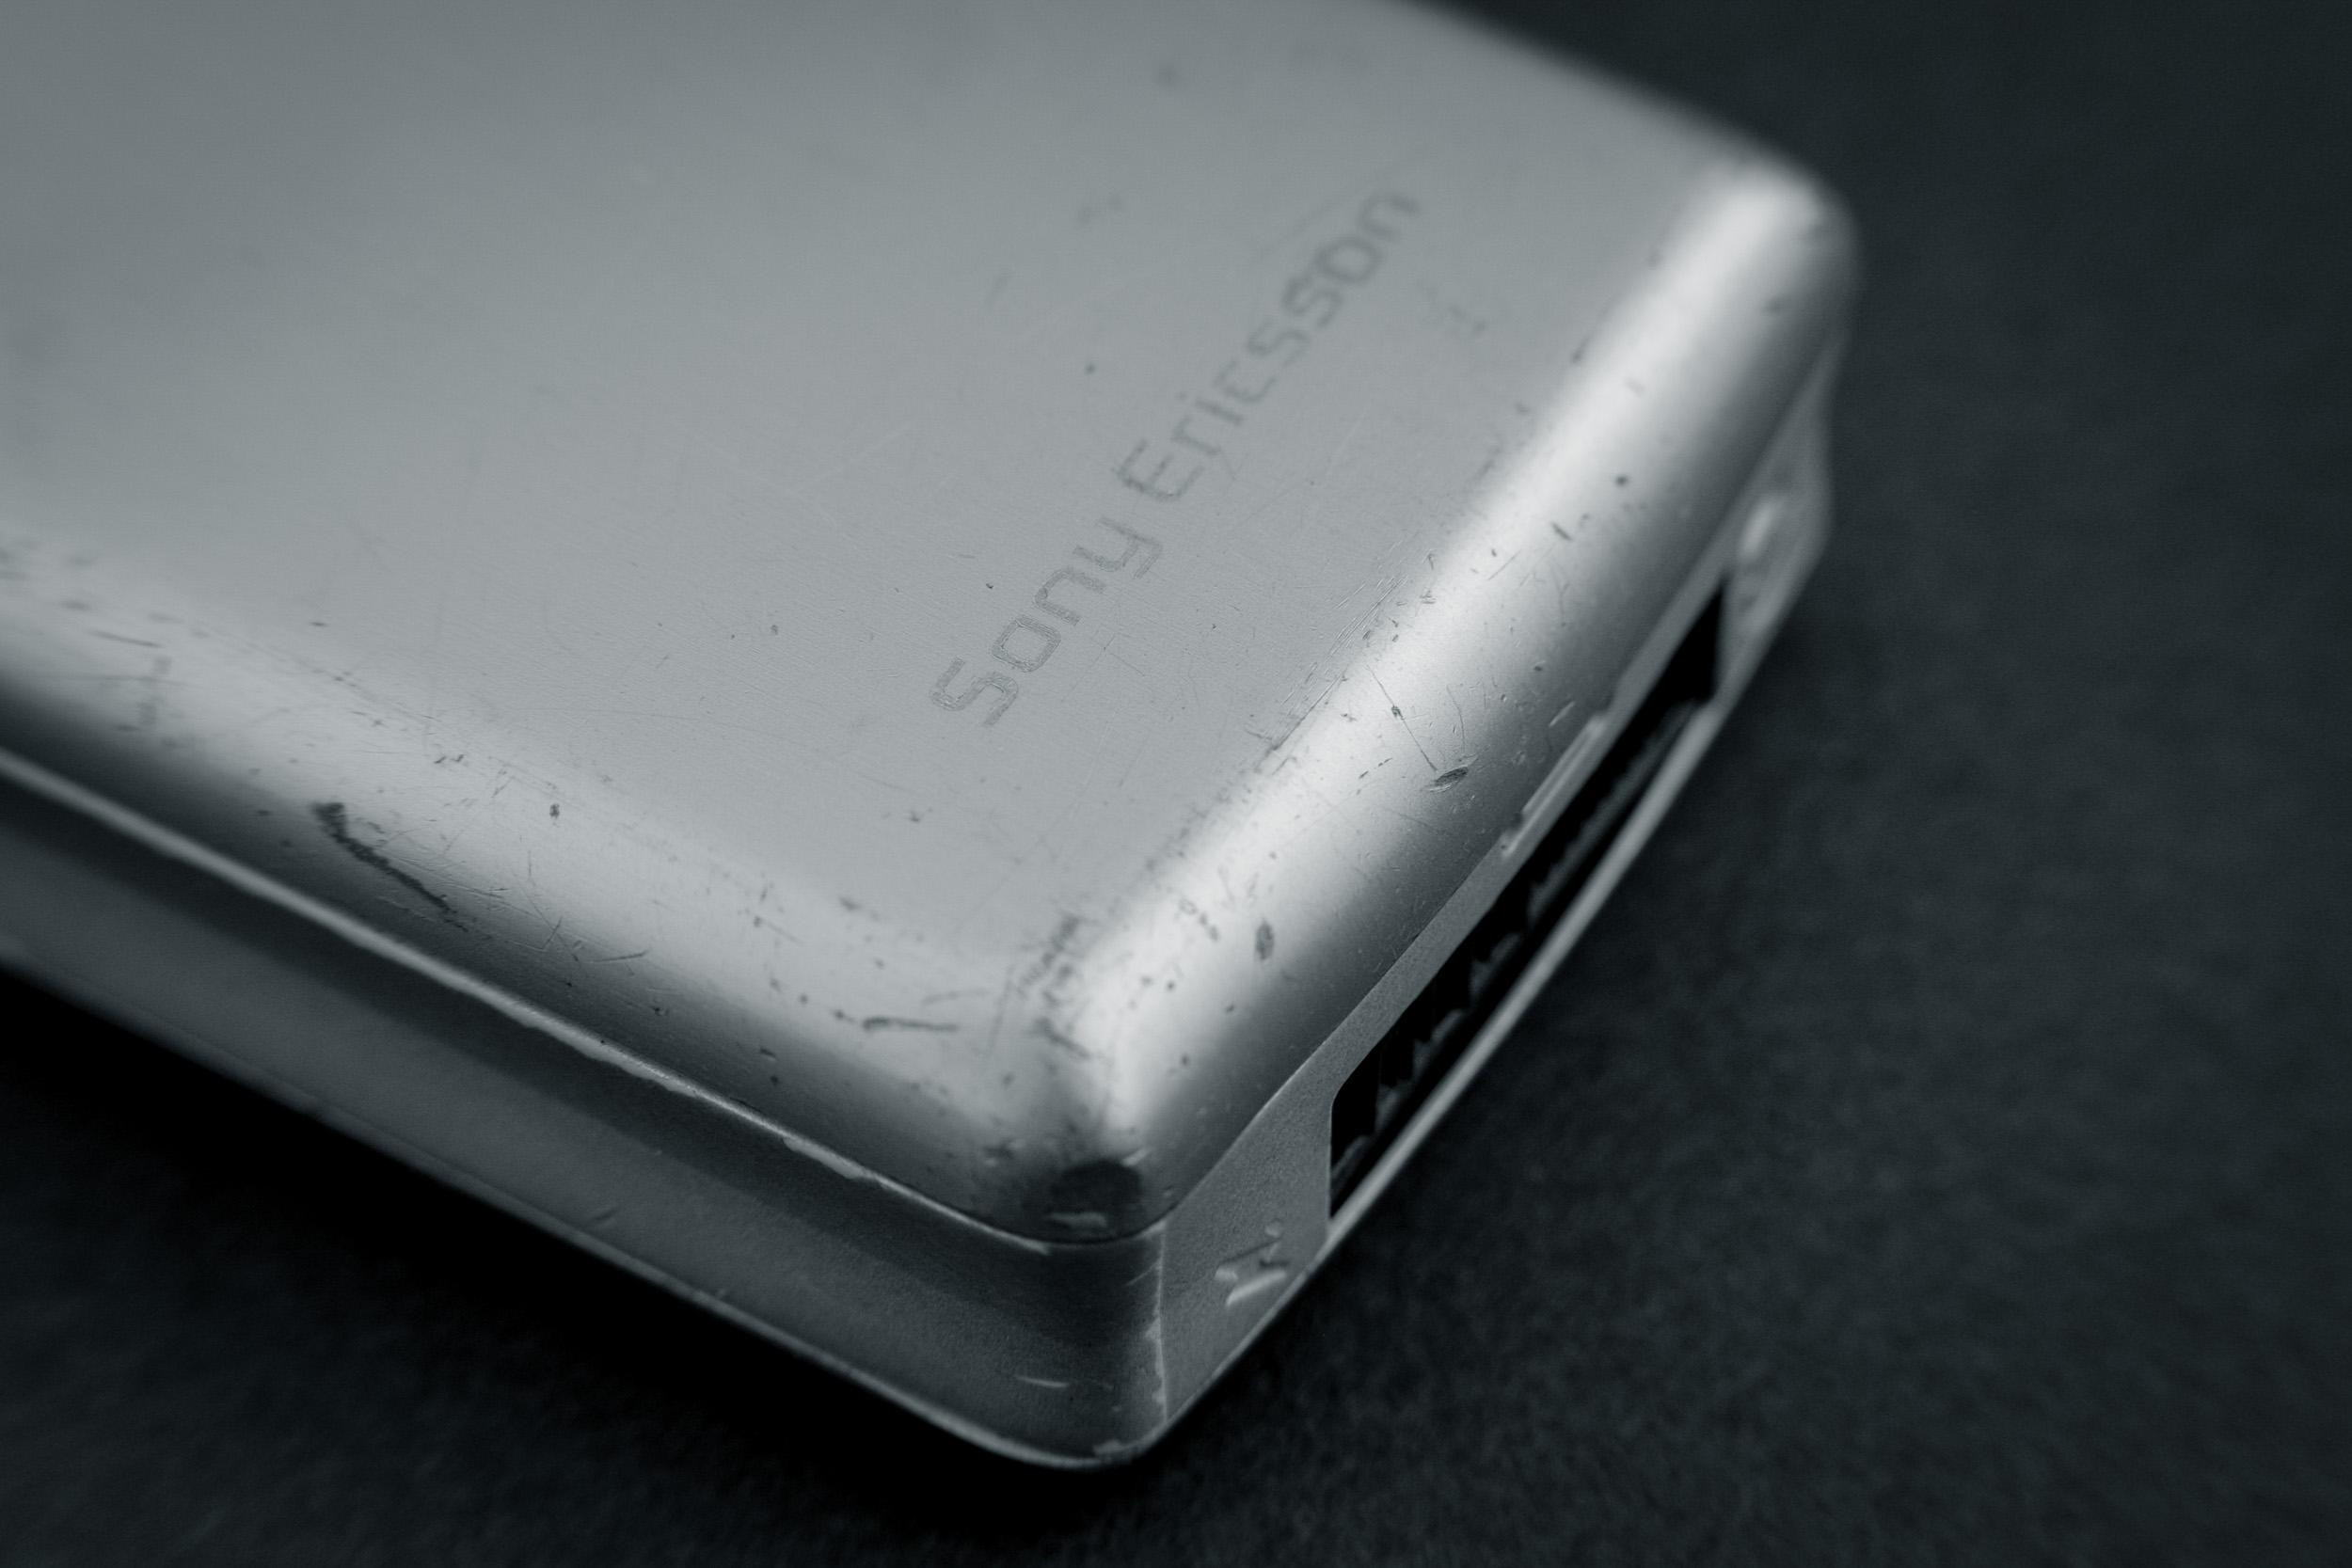 The Sony Ericsson word mark